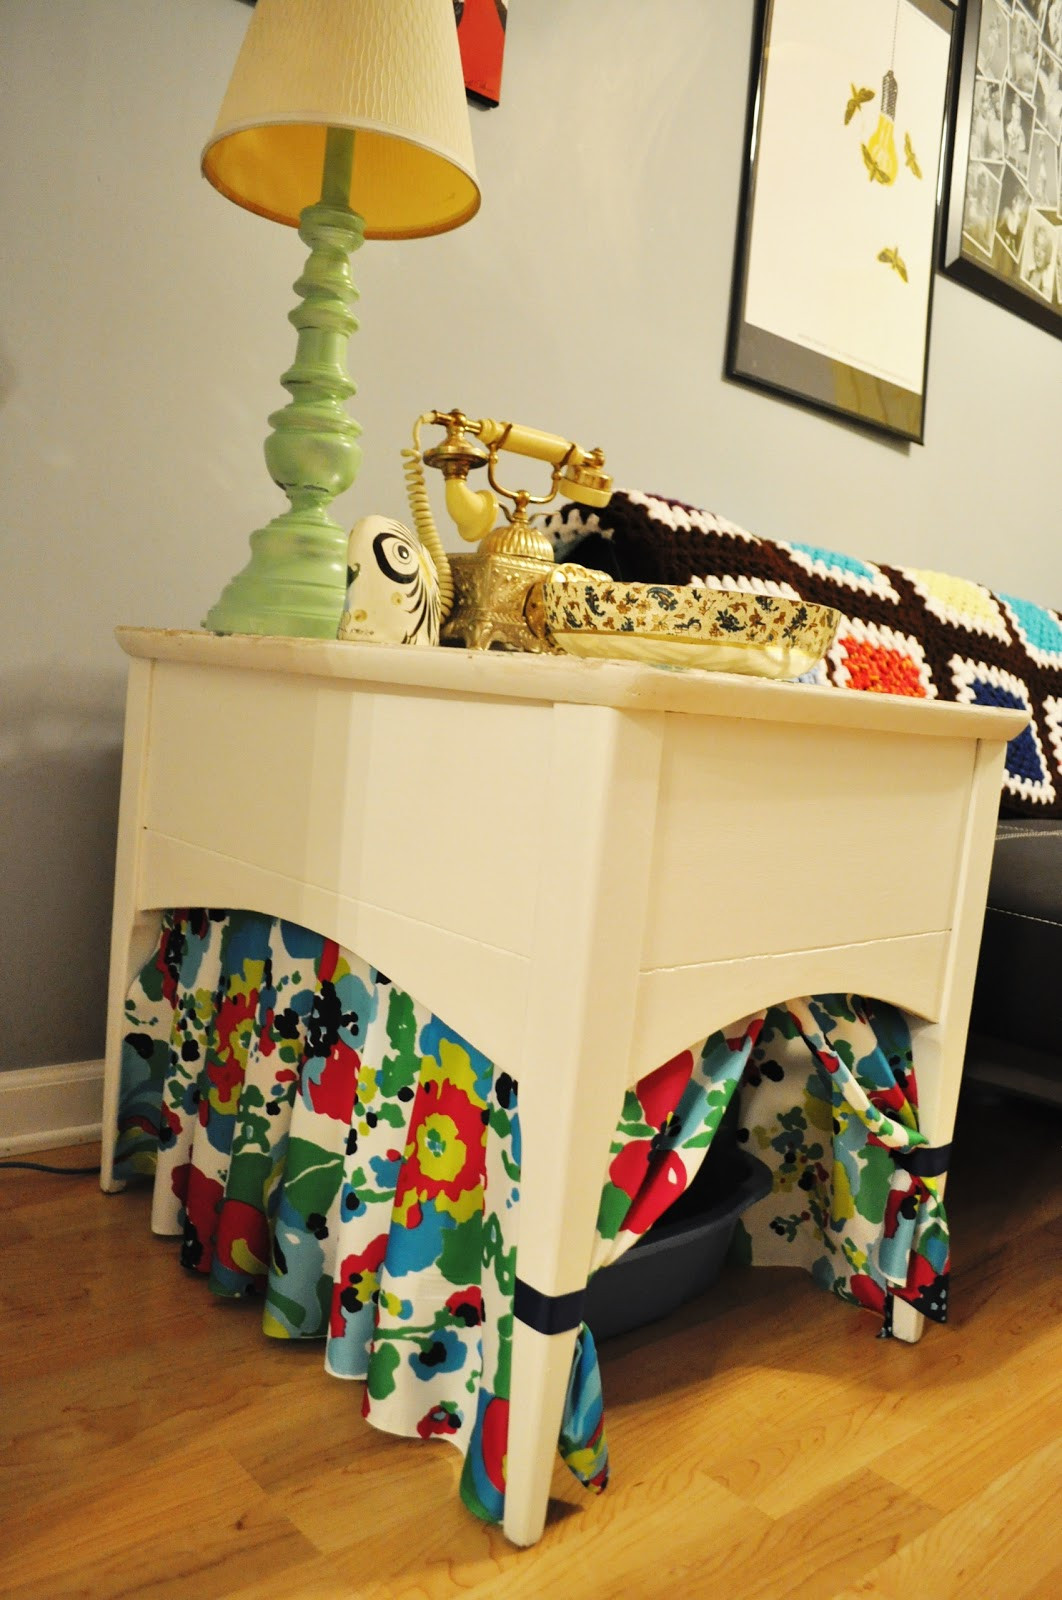 Cat Litter Box DIY  beetlebailey Kitty Litter Box Table DIY